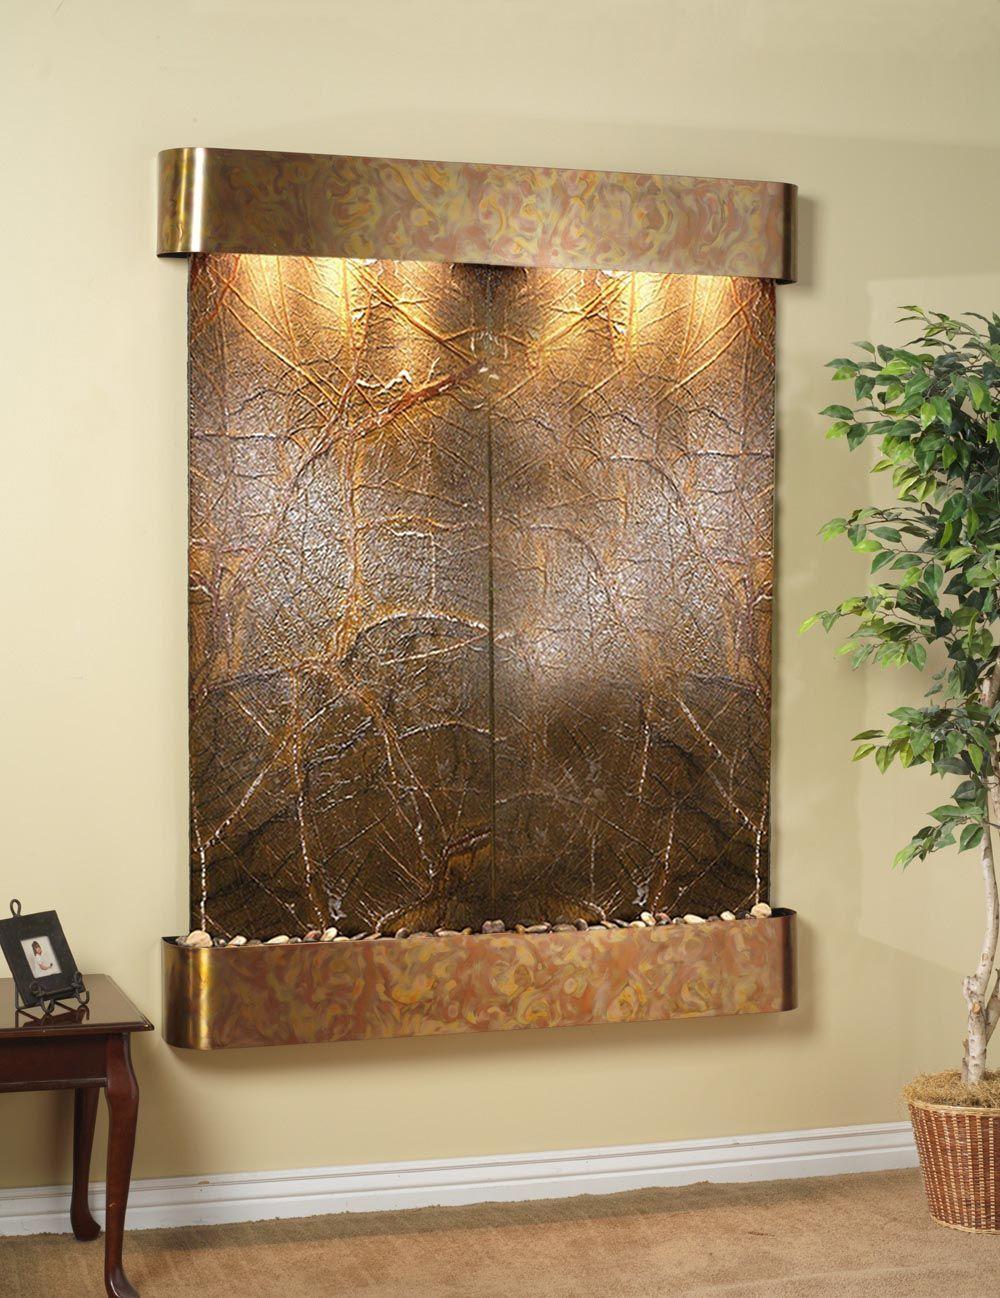 waterfall indoor fountain indoor fountains pinterest. Black Bedroom Furniture Sets. Home Design Ideas